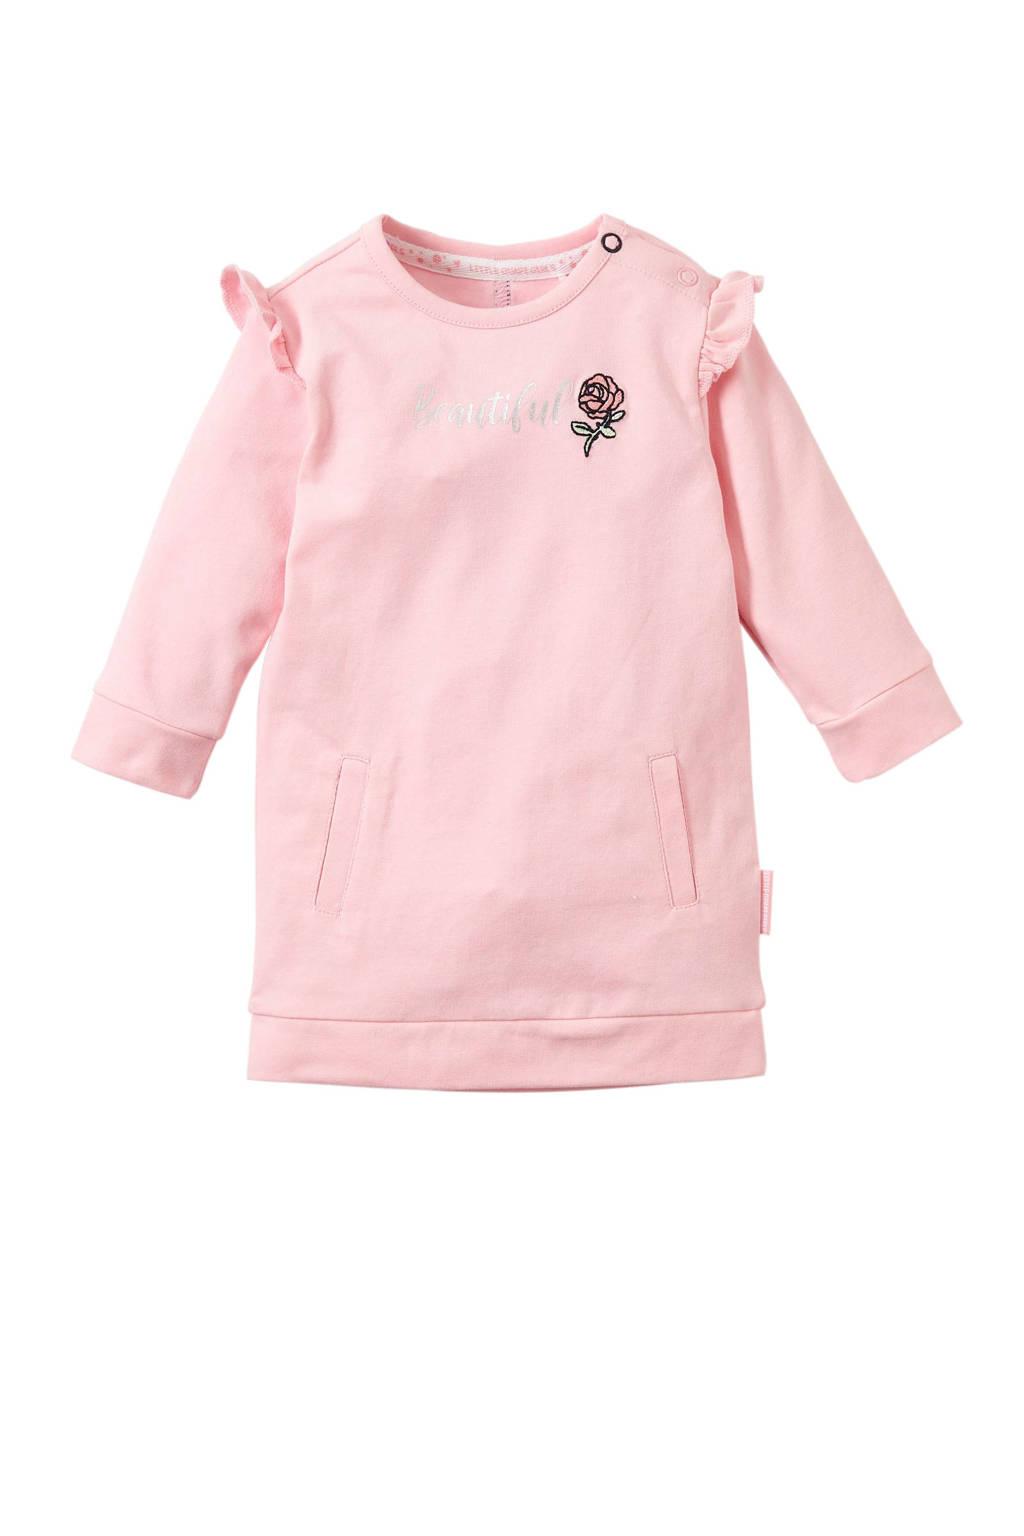 Quapi baby jurk Xanne met tekst roze, Lichtroze